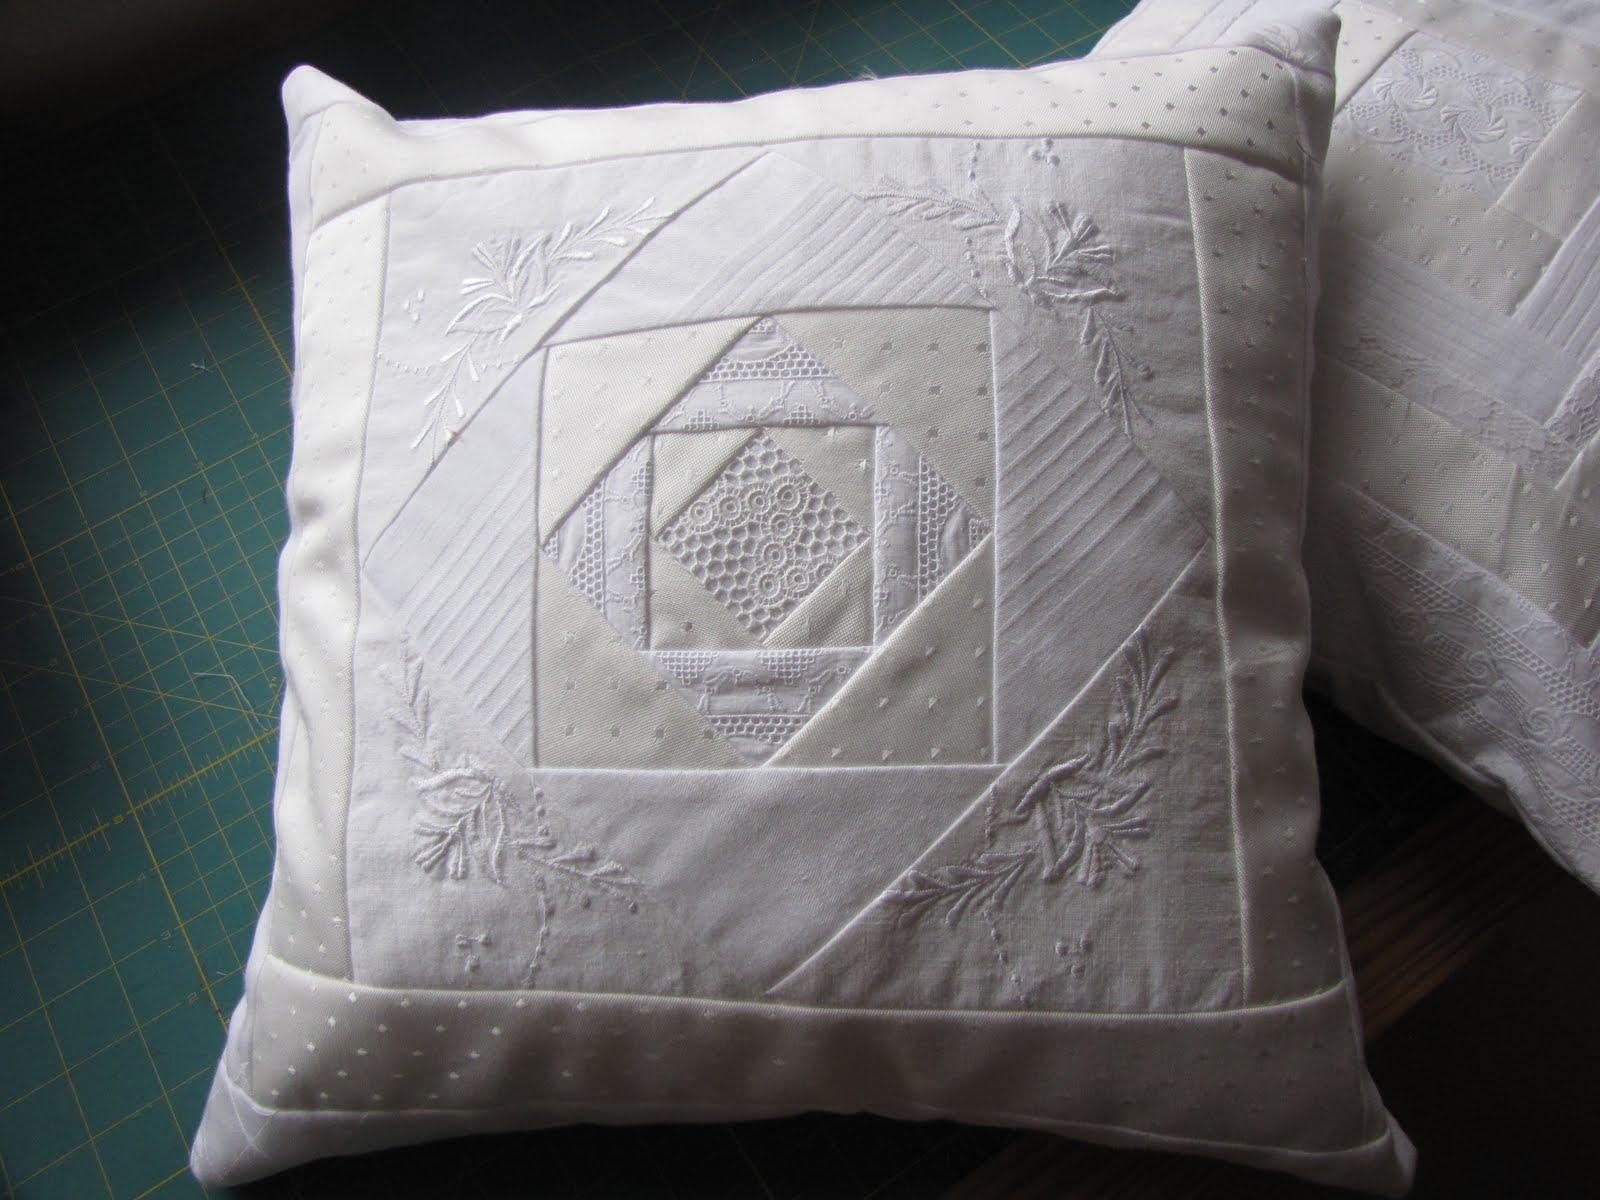 claudias quilt blog aus alt macht neu from old to new. Black Bedroom Furniture Sets. Home Design Ideas